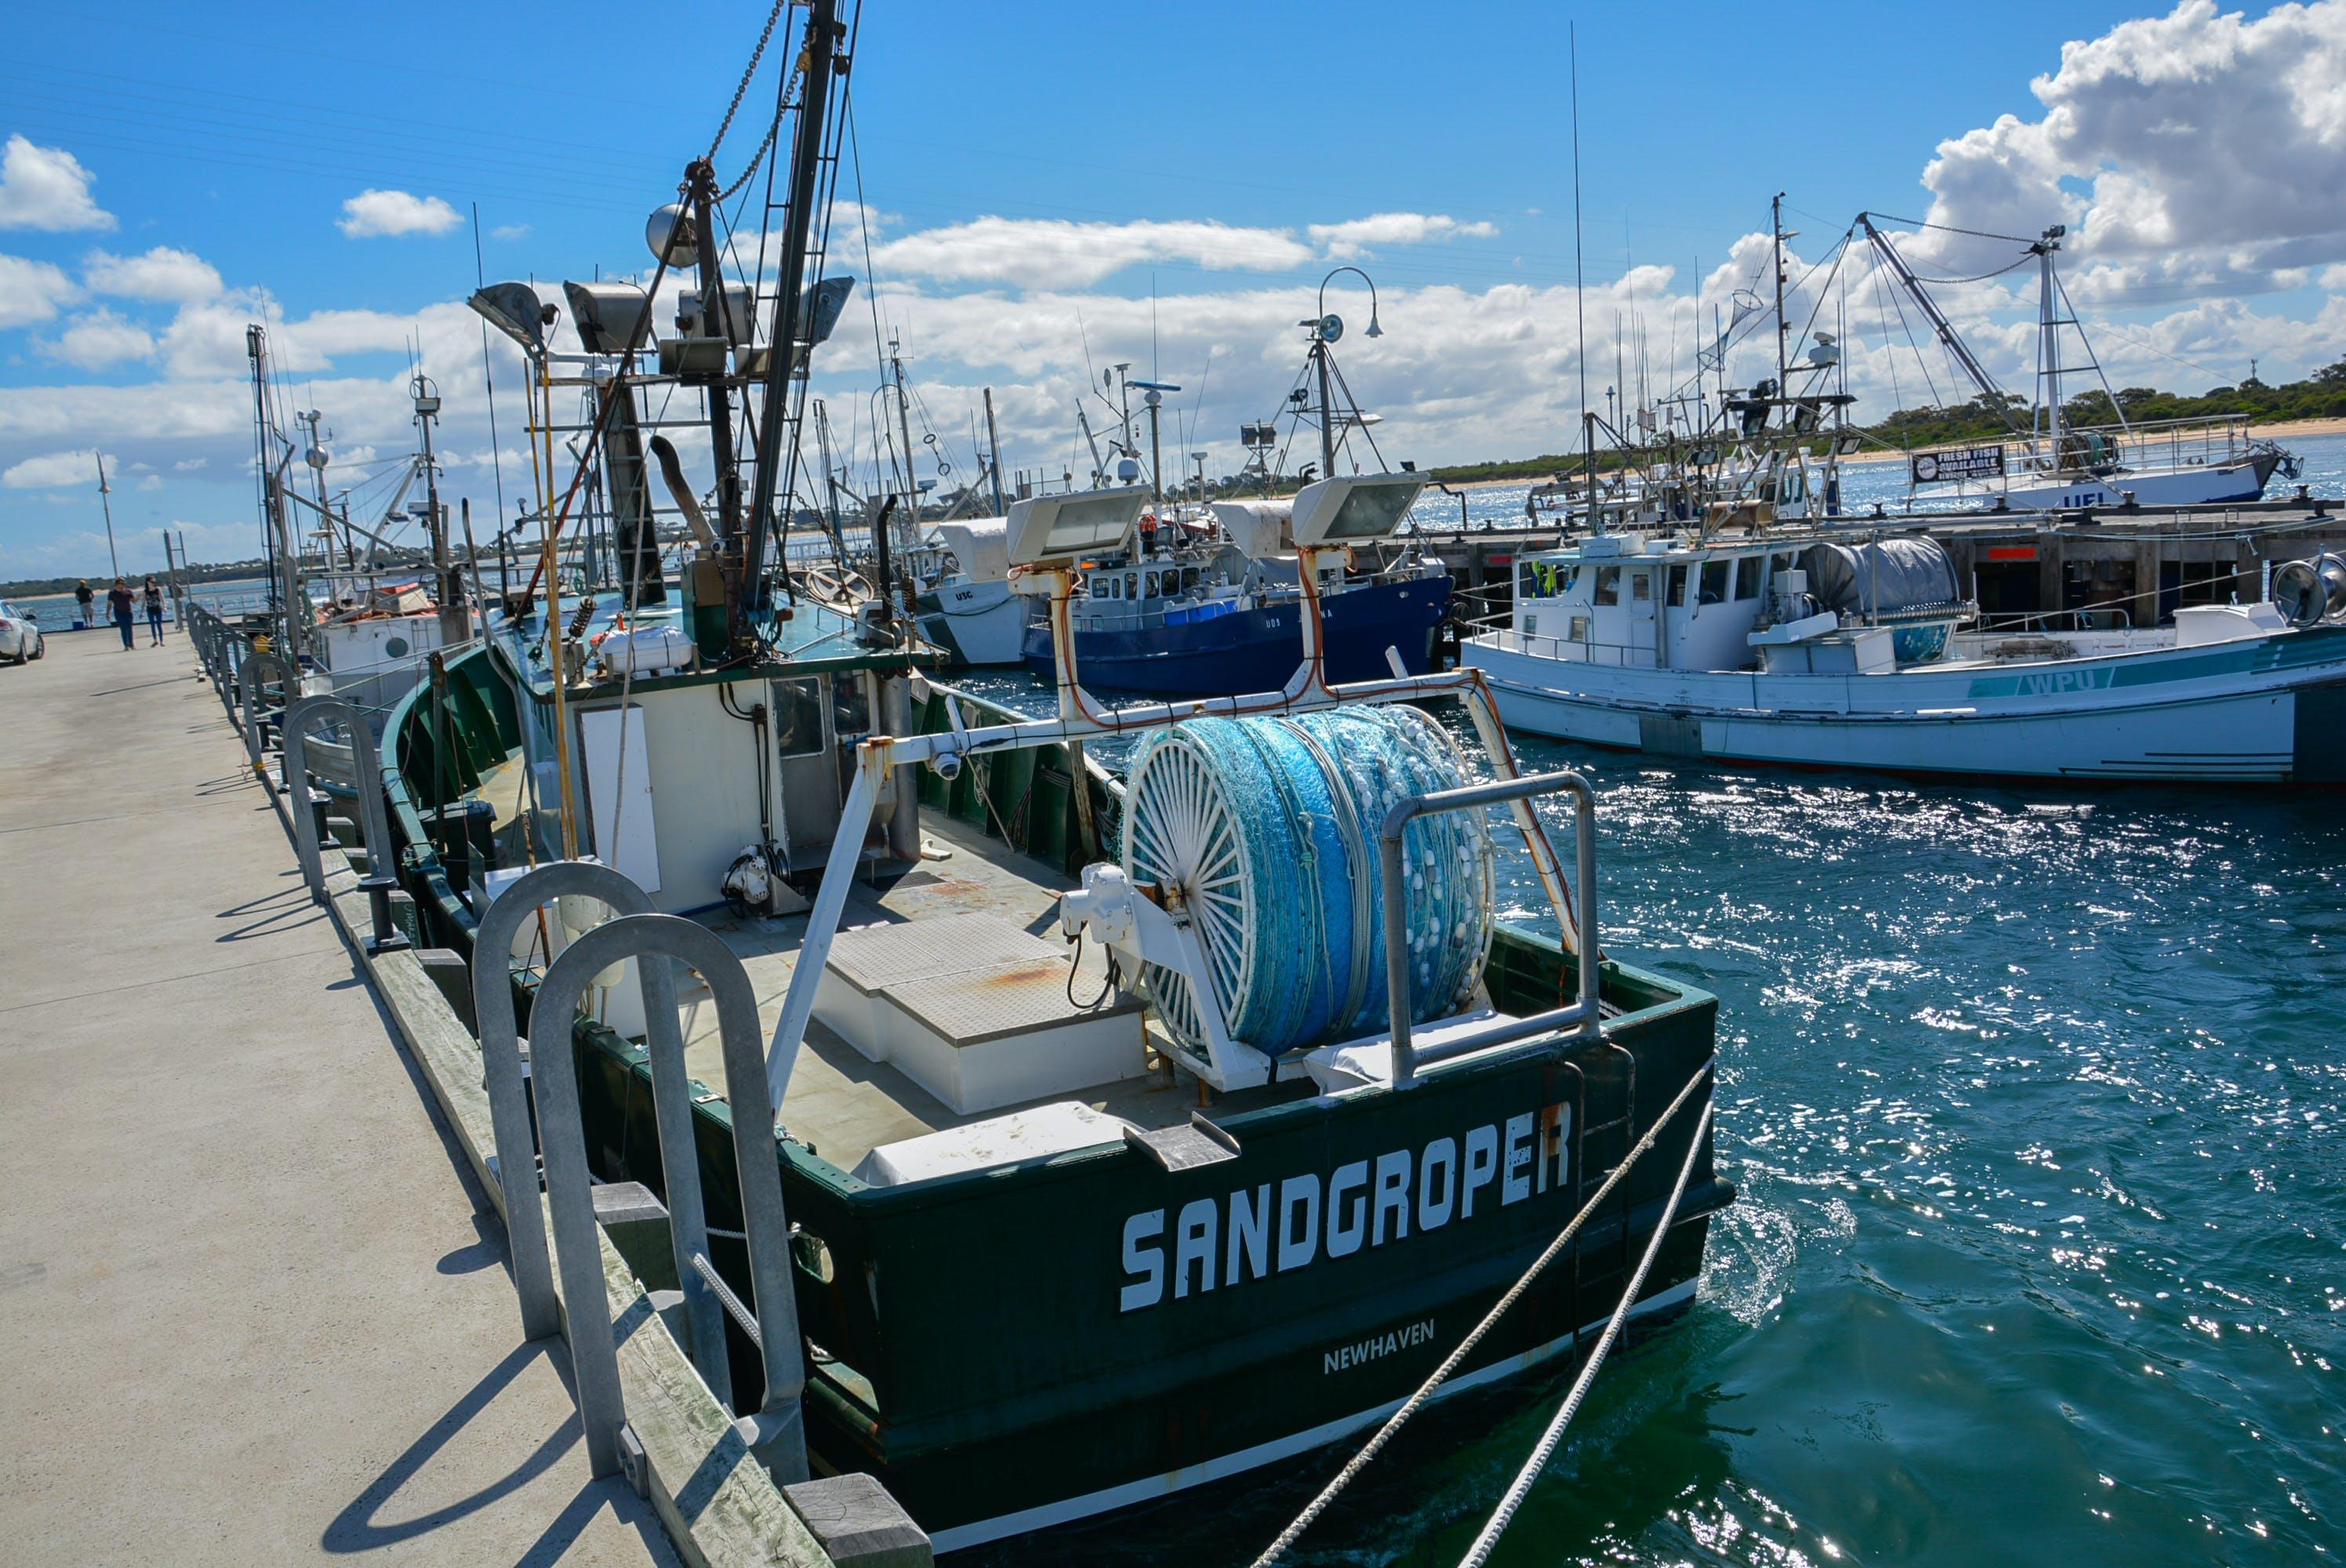 Free stock photo of #melbourne #wharf #fishing #boat #sandgroper